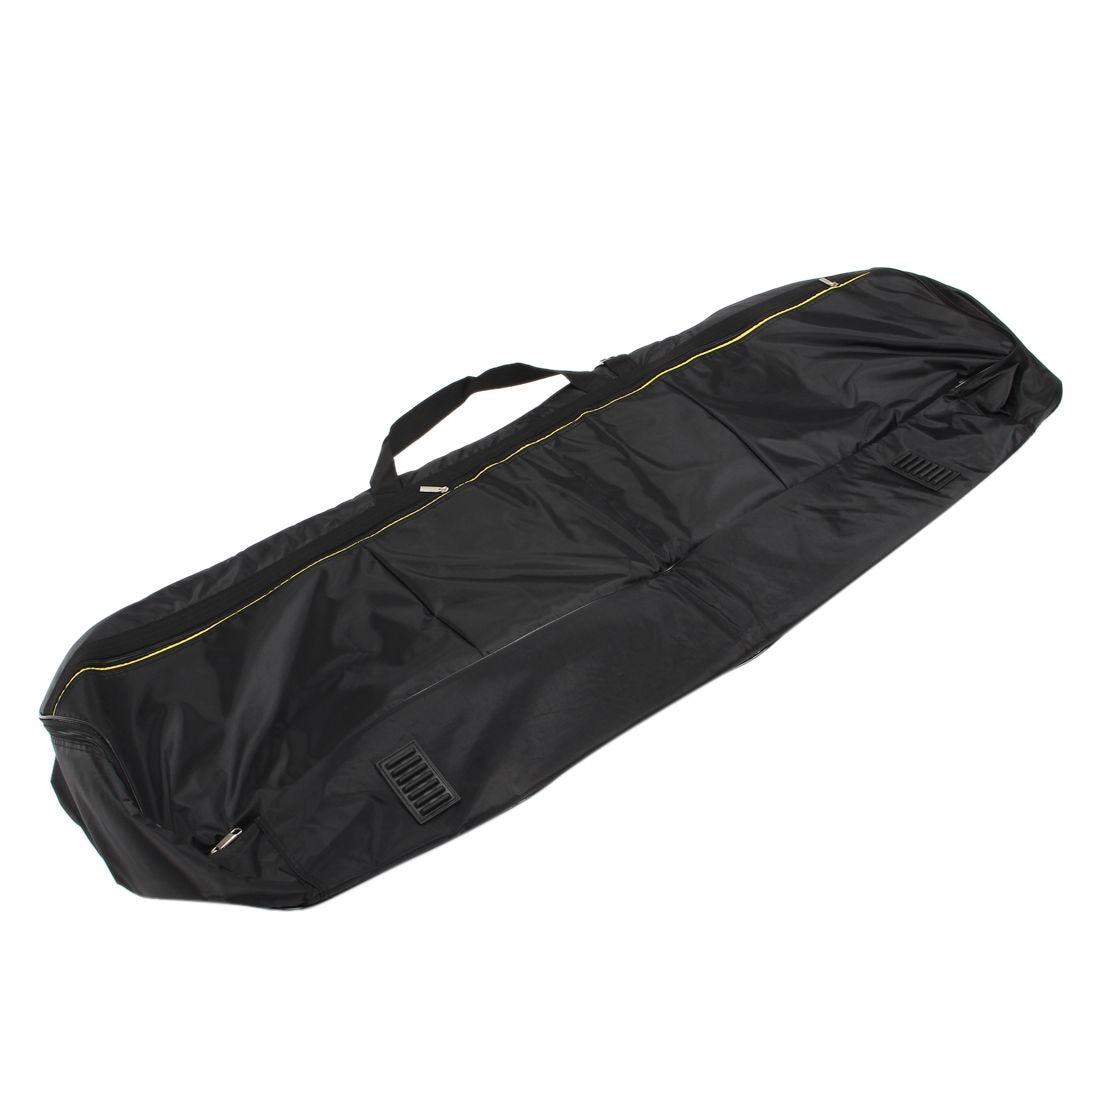 MSOR-Portable 88-Key Keyboard Electric Piano Padded Case Gig Bag Oxford Cloth